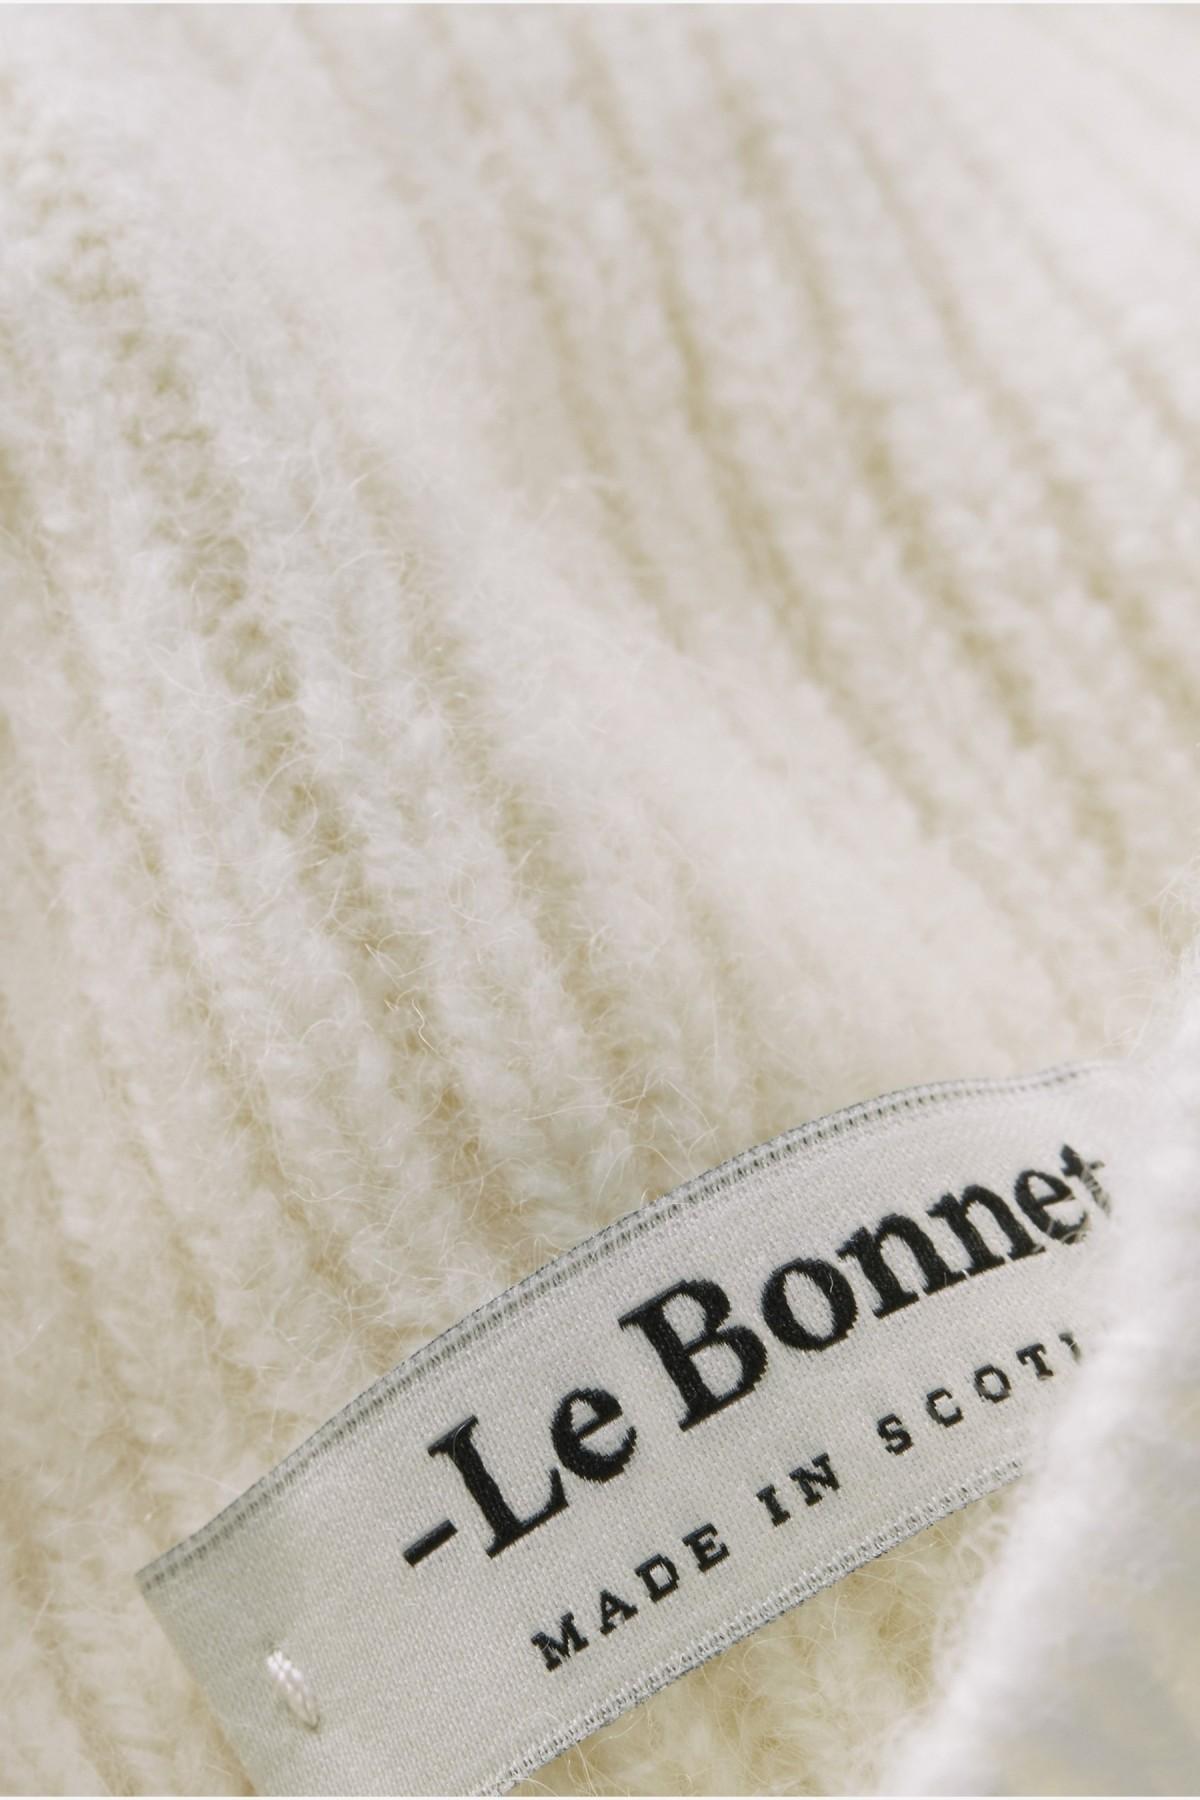 LeBonnet Beanie in Snow